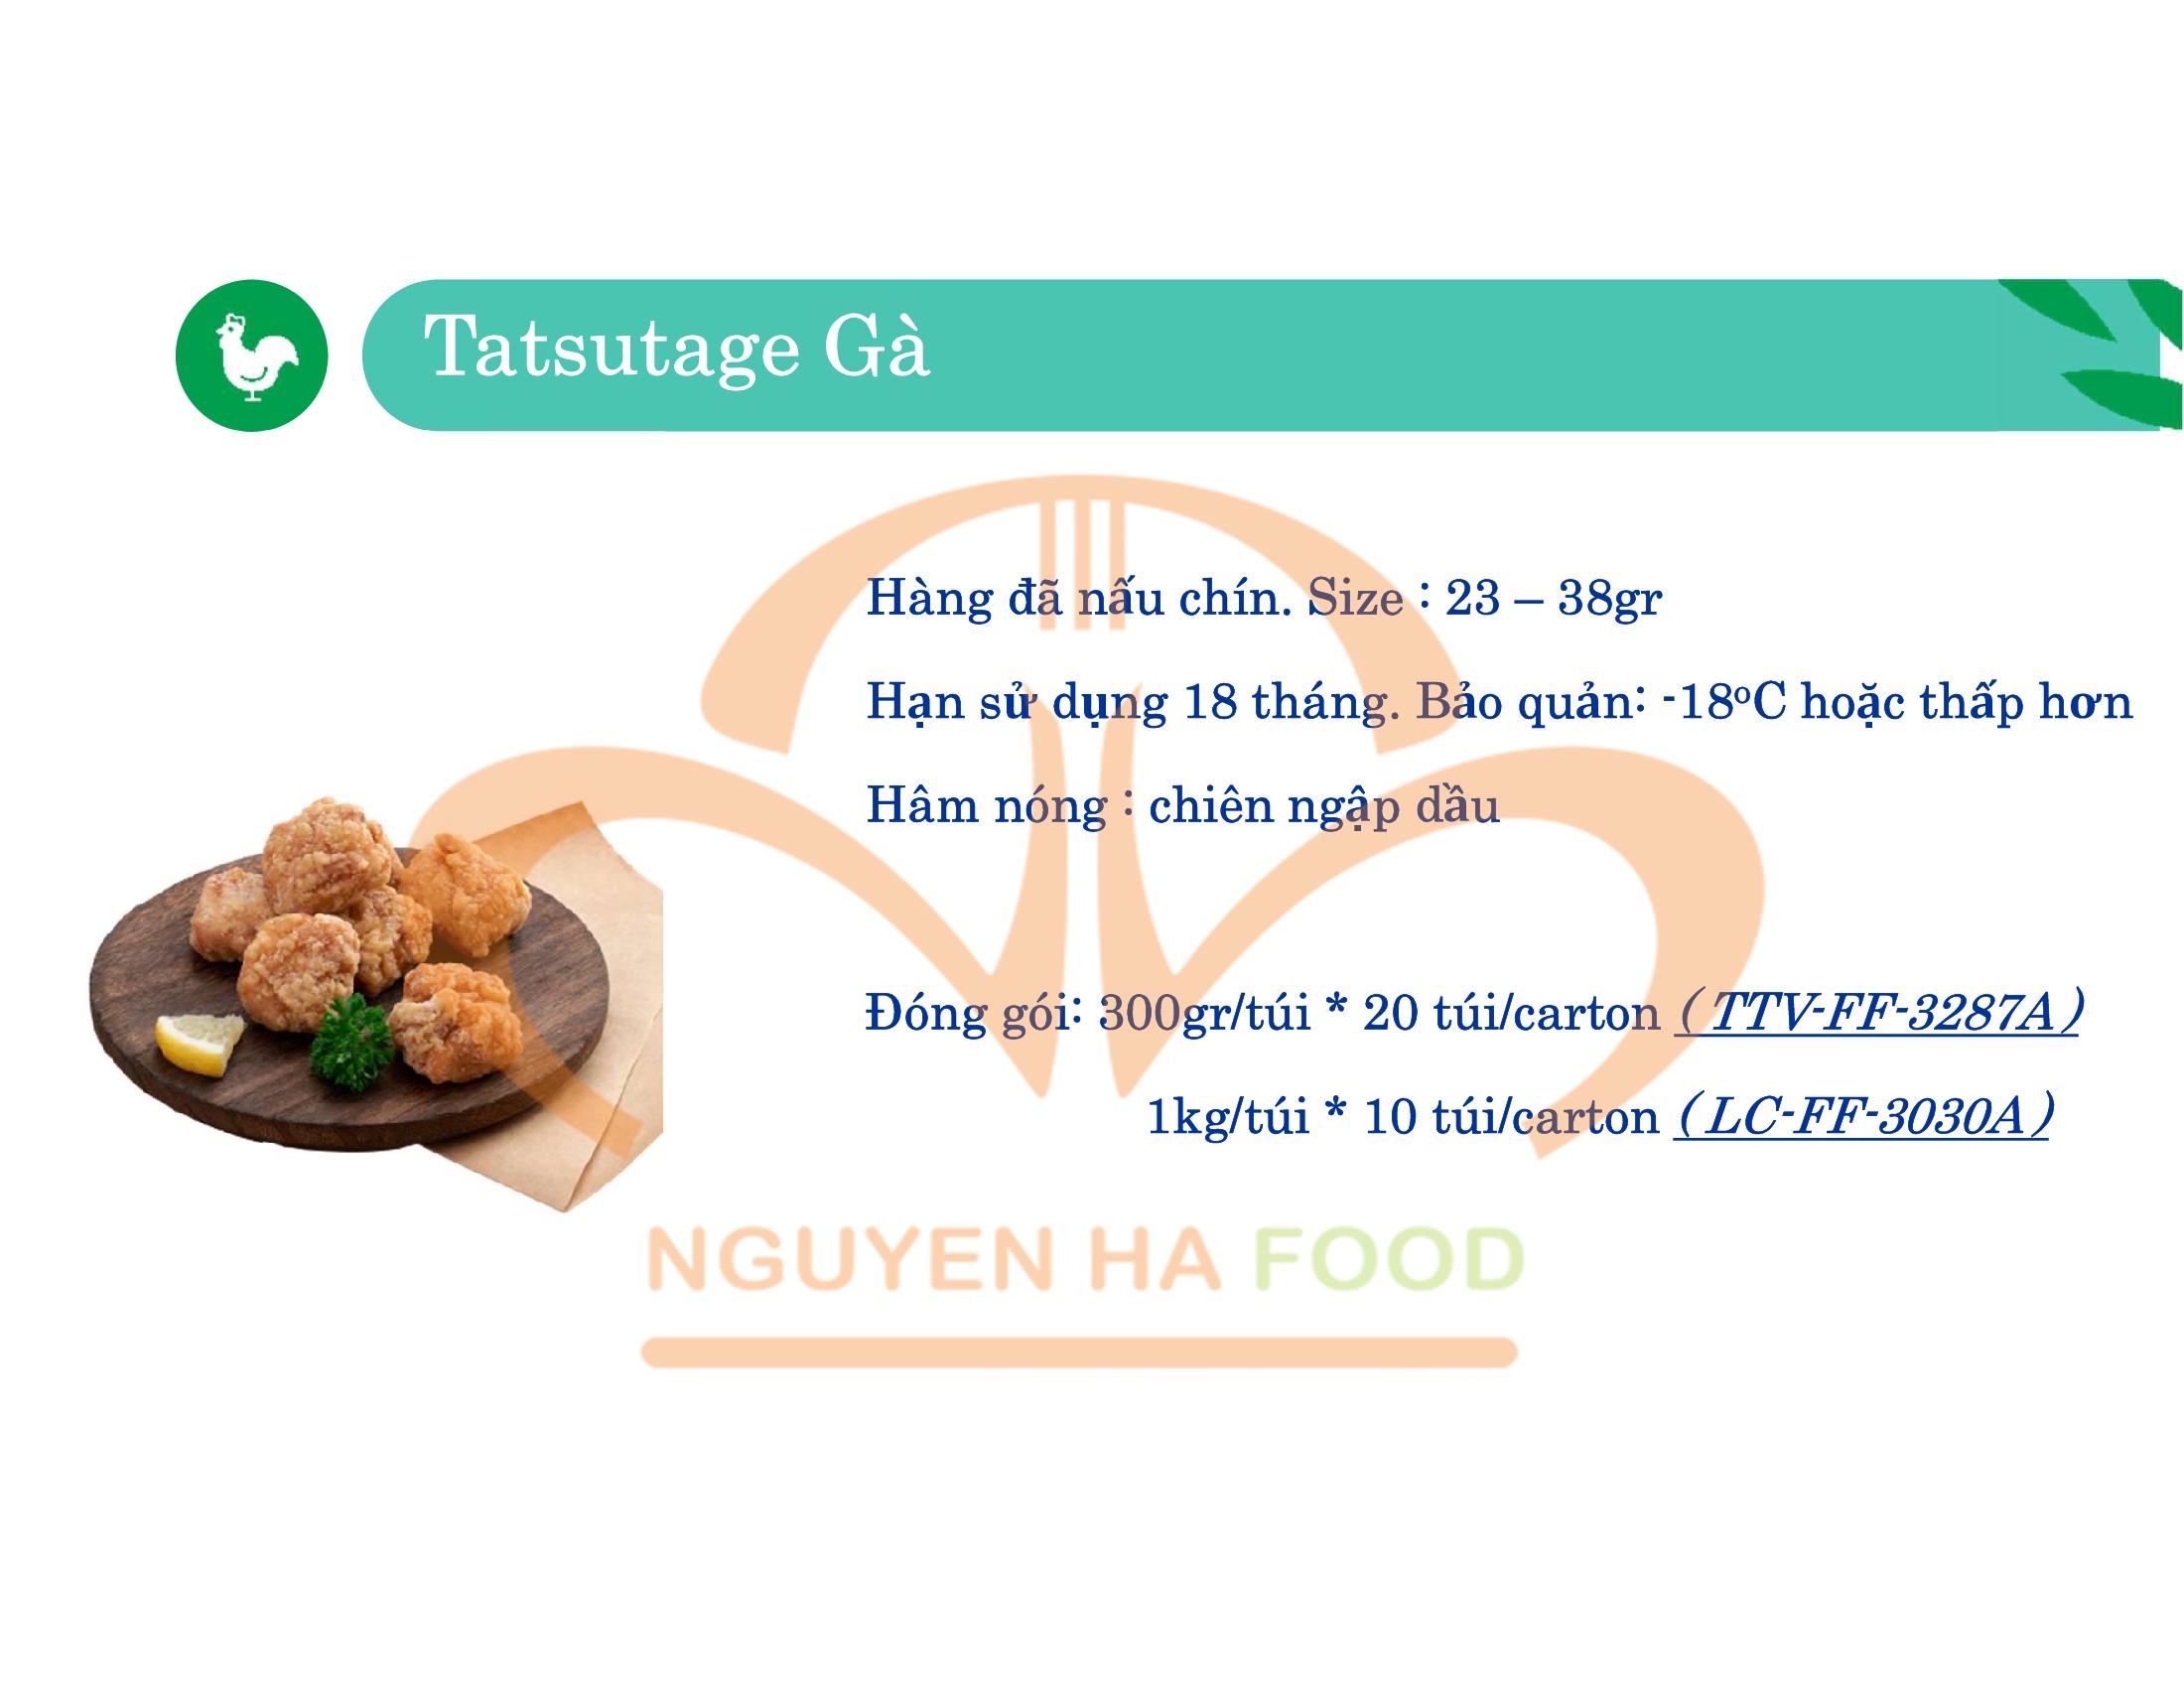 03 GA TATSUTAGE CP NGUYEN HA FOOD